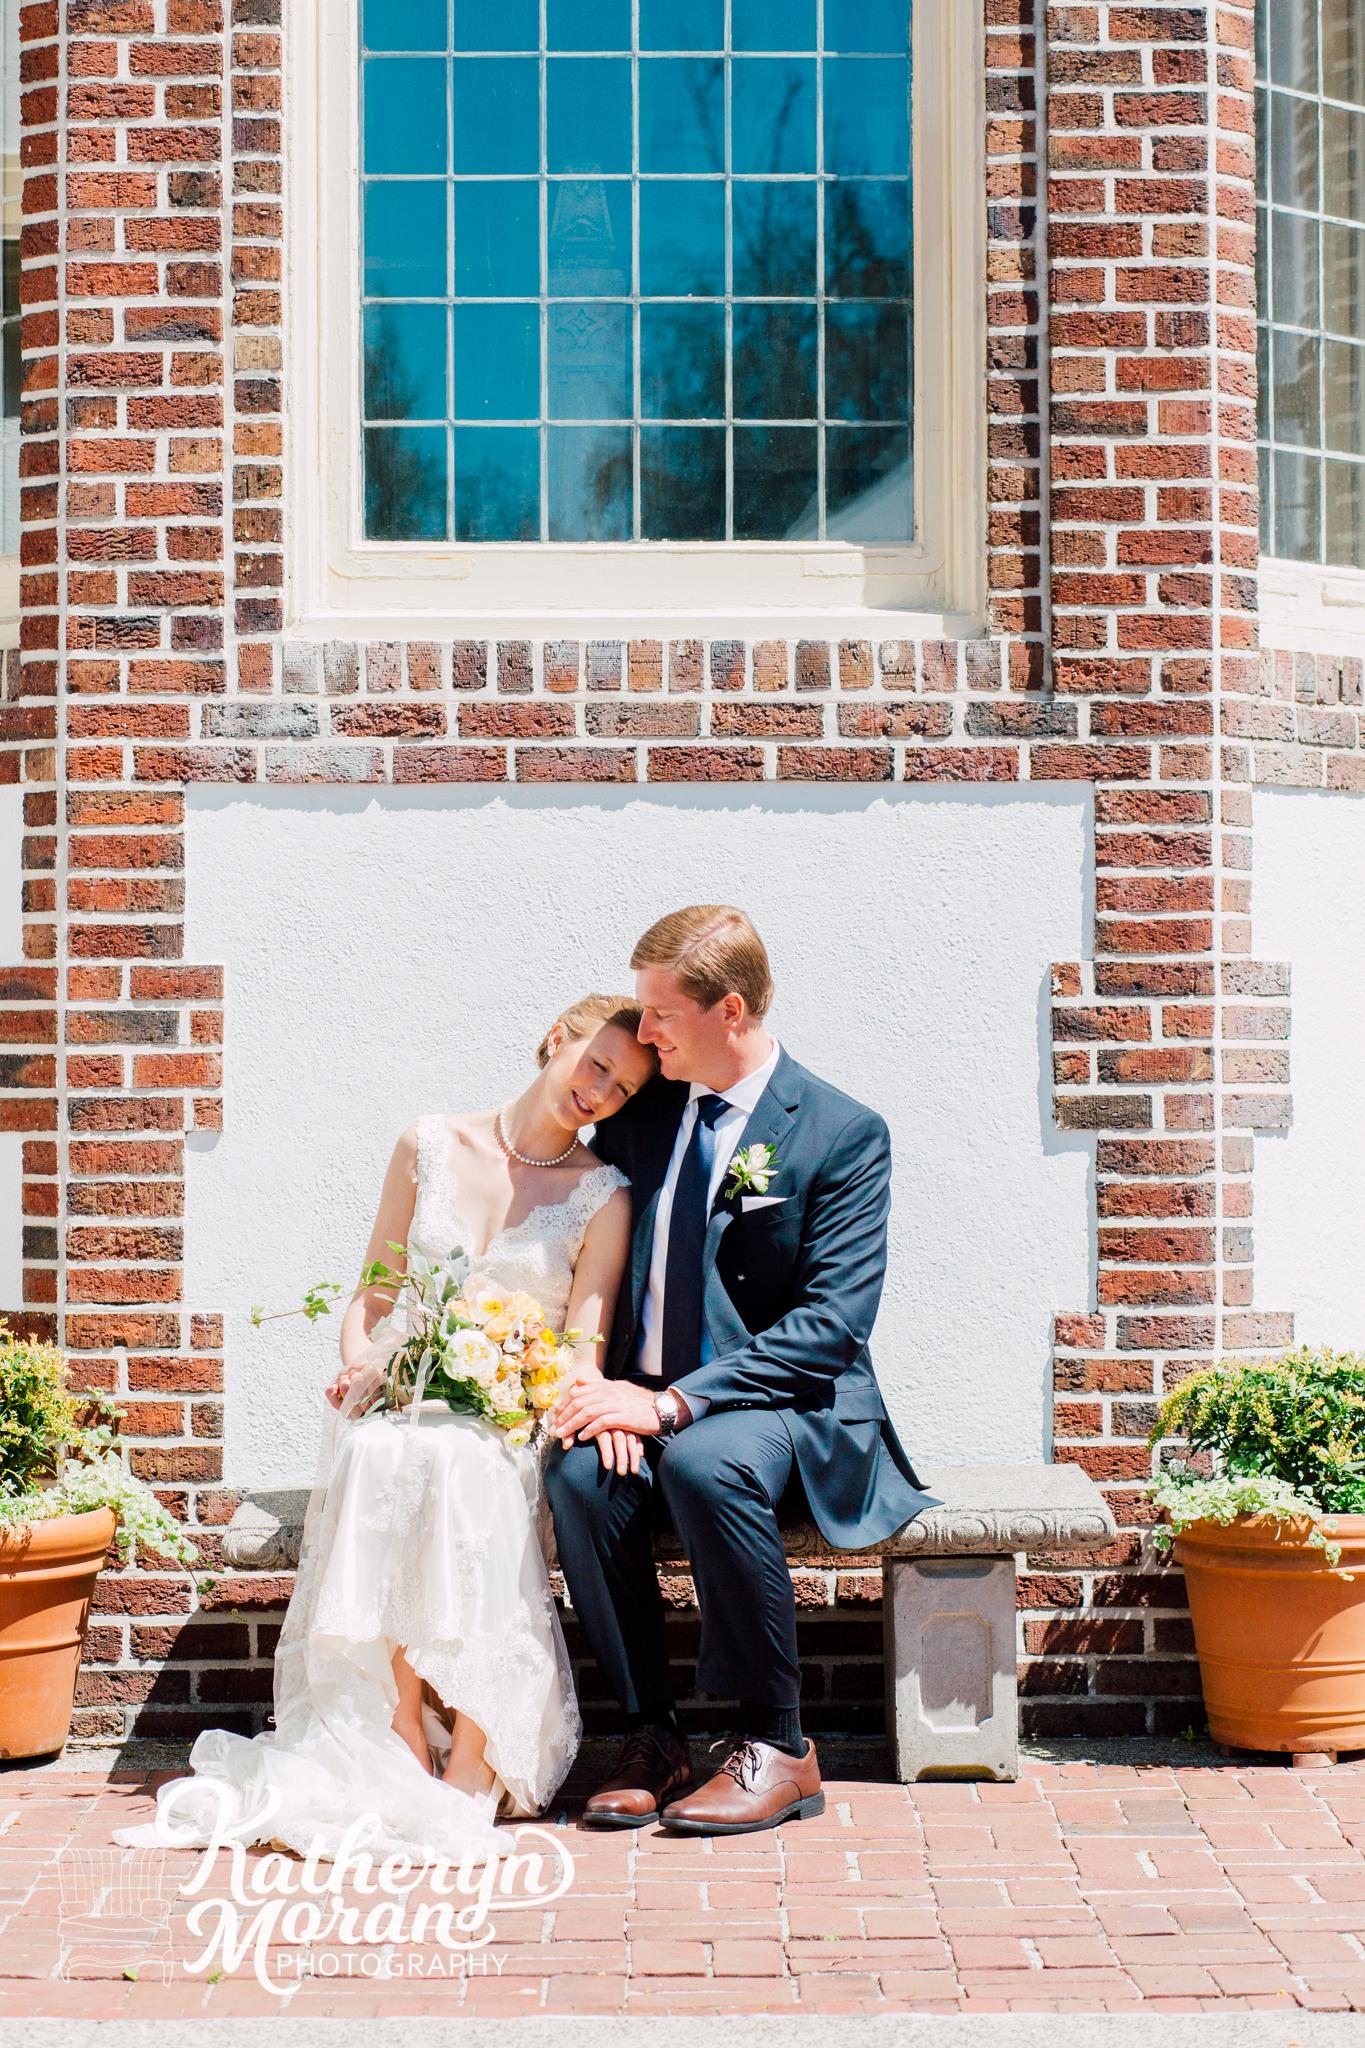 bellingham-wedding-photographer-lairmont-manor-katheryn-moran-9.jpg